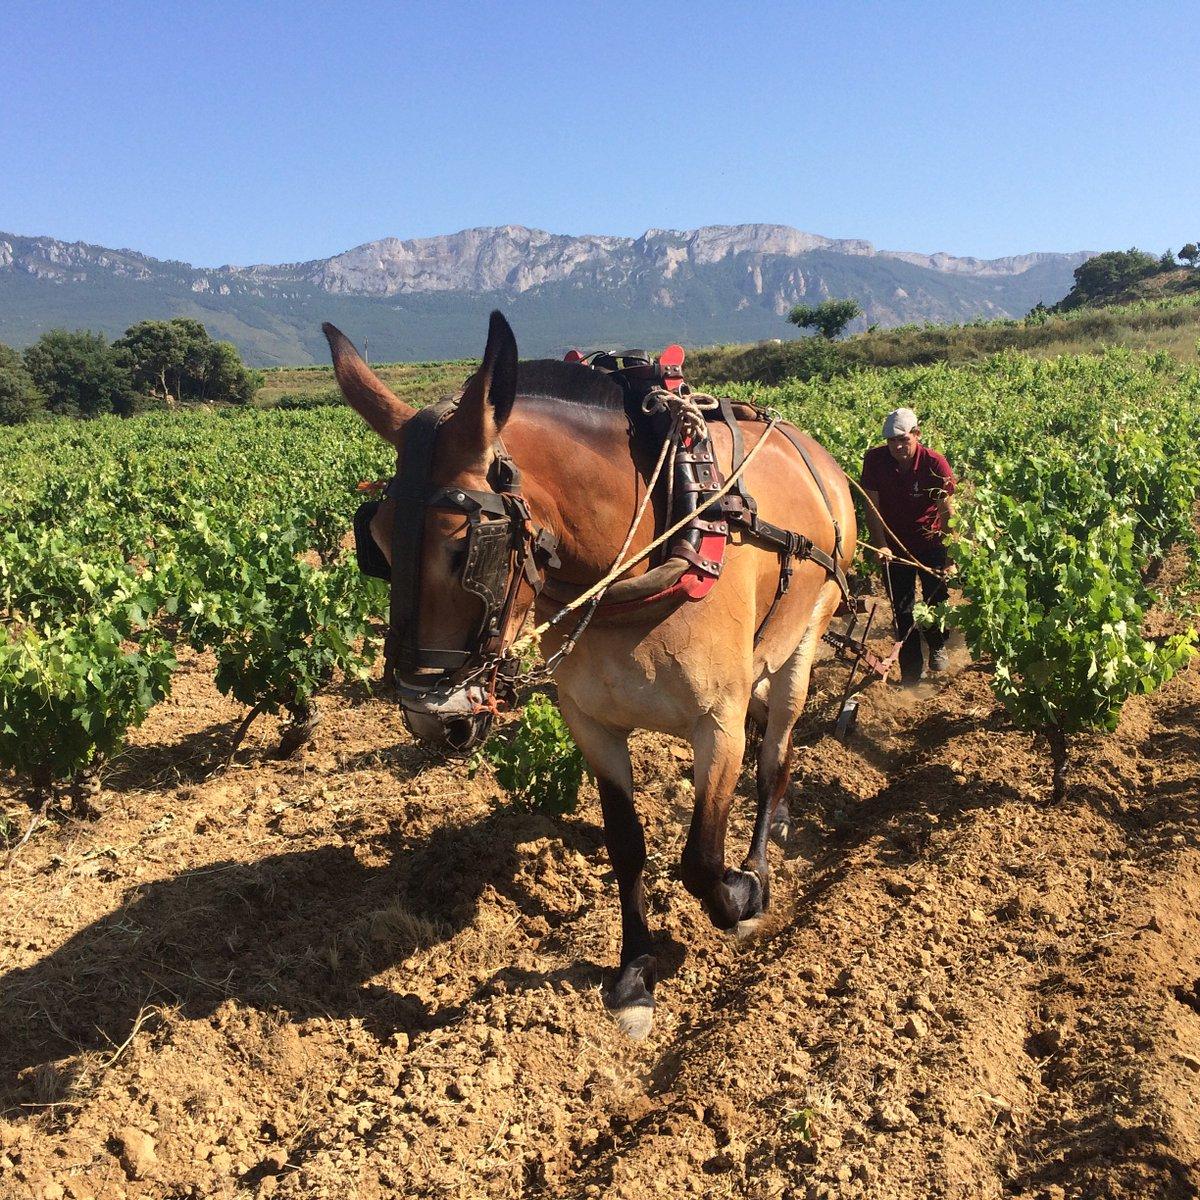 BLOG POST: Will Basque Rioja break away from Rioja? https://t.co/n3piiMTFwM #wine #RiojaAlavesa https://t.co/CorLMUSKoX